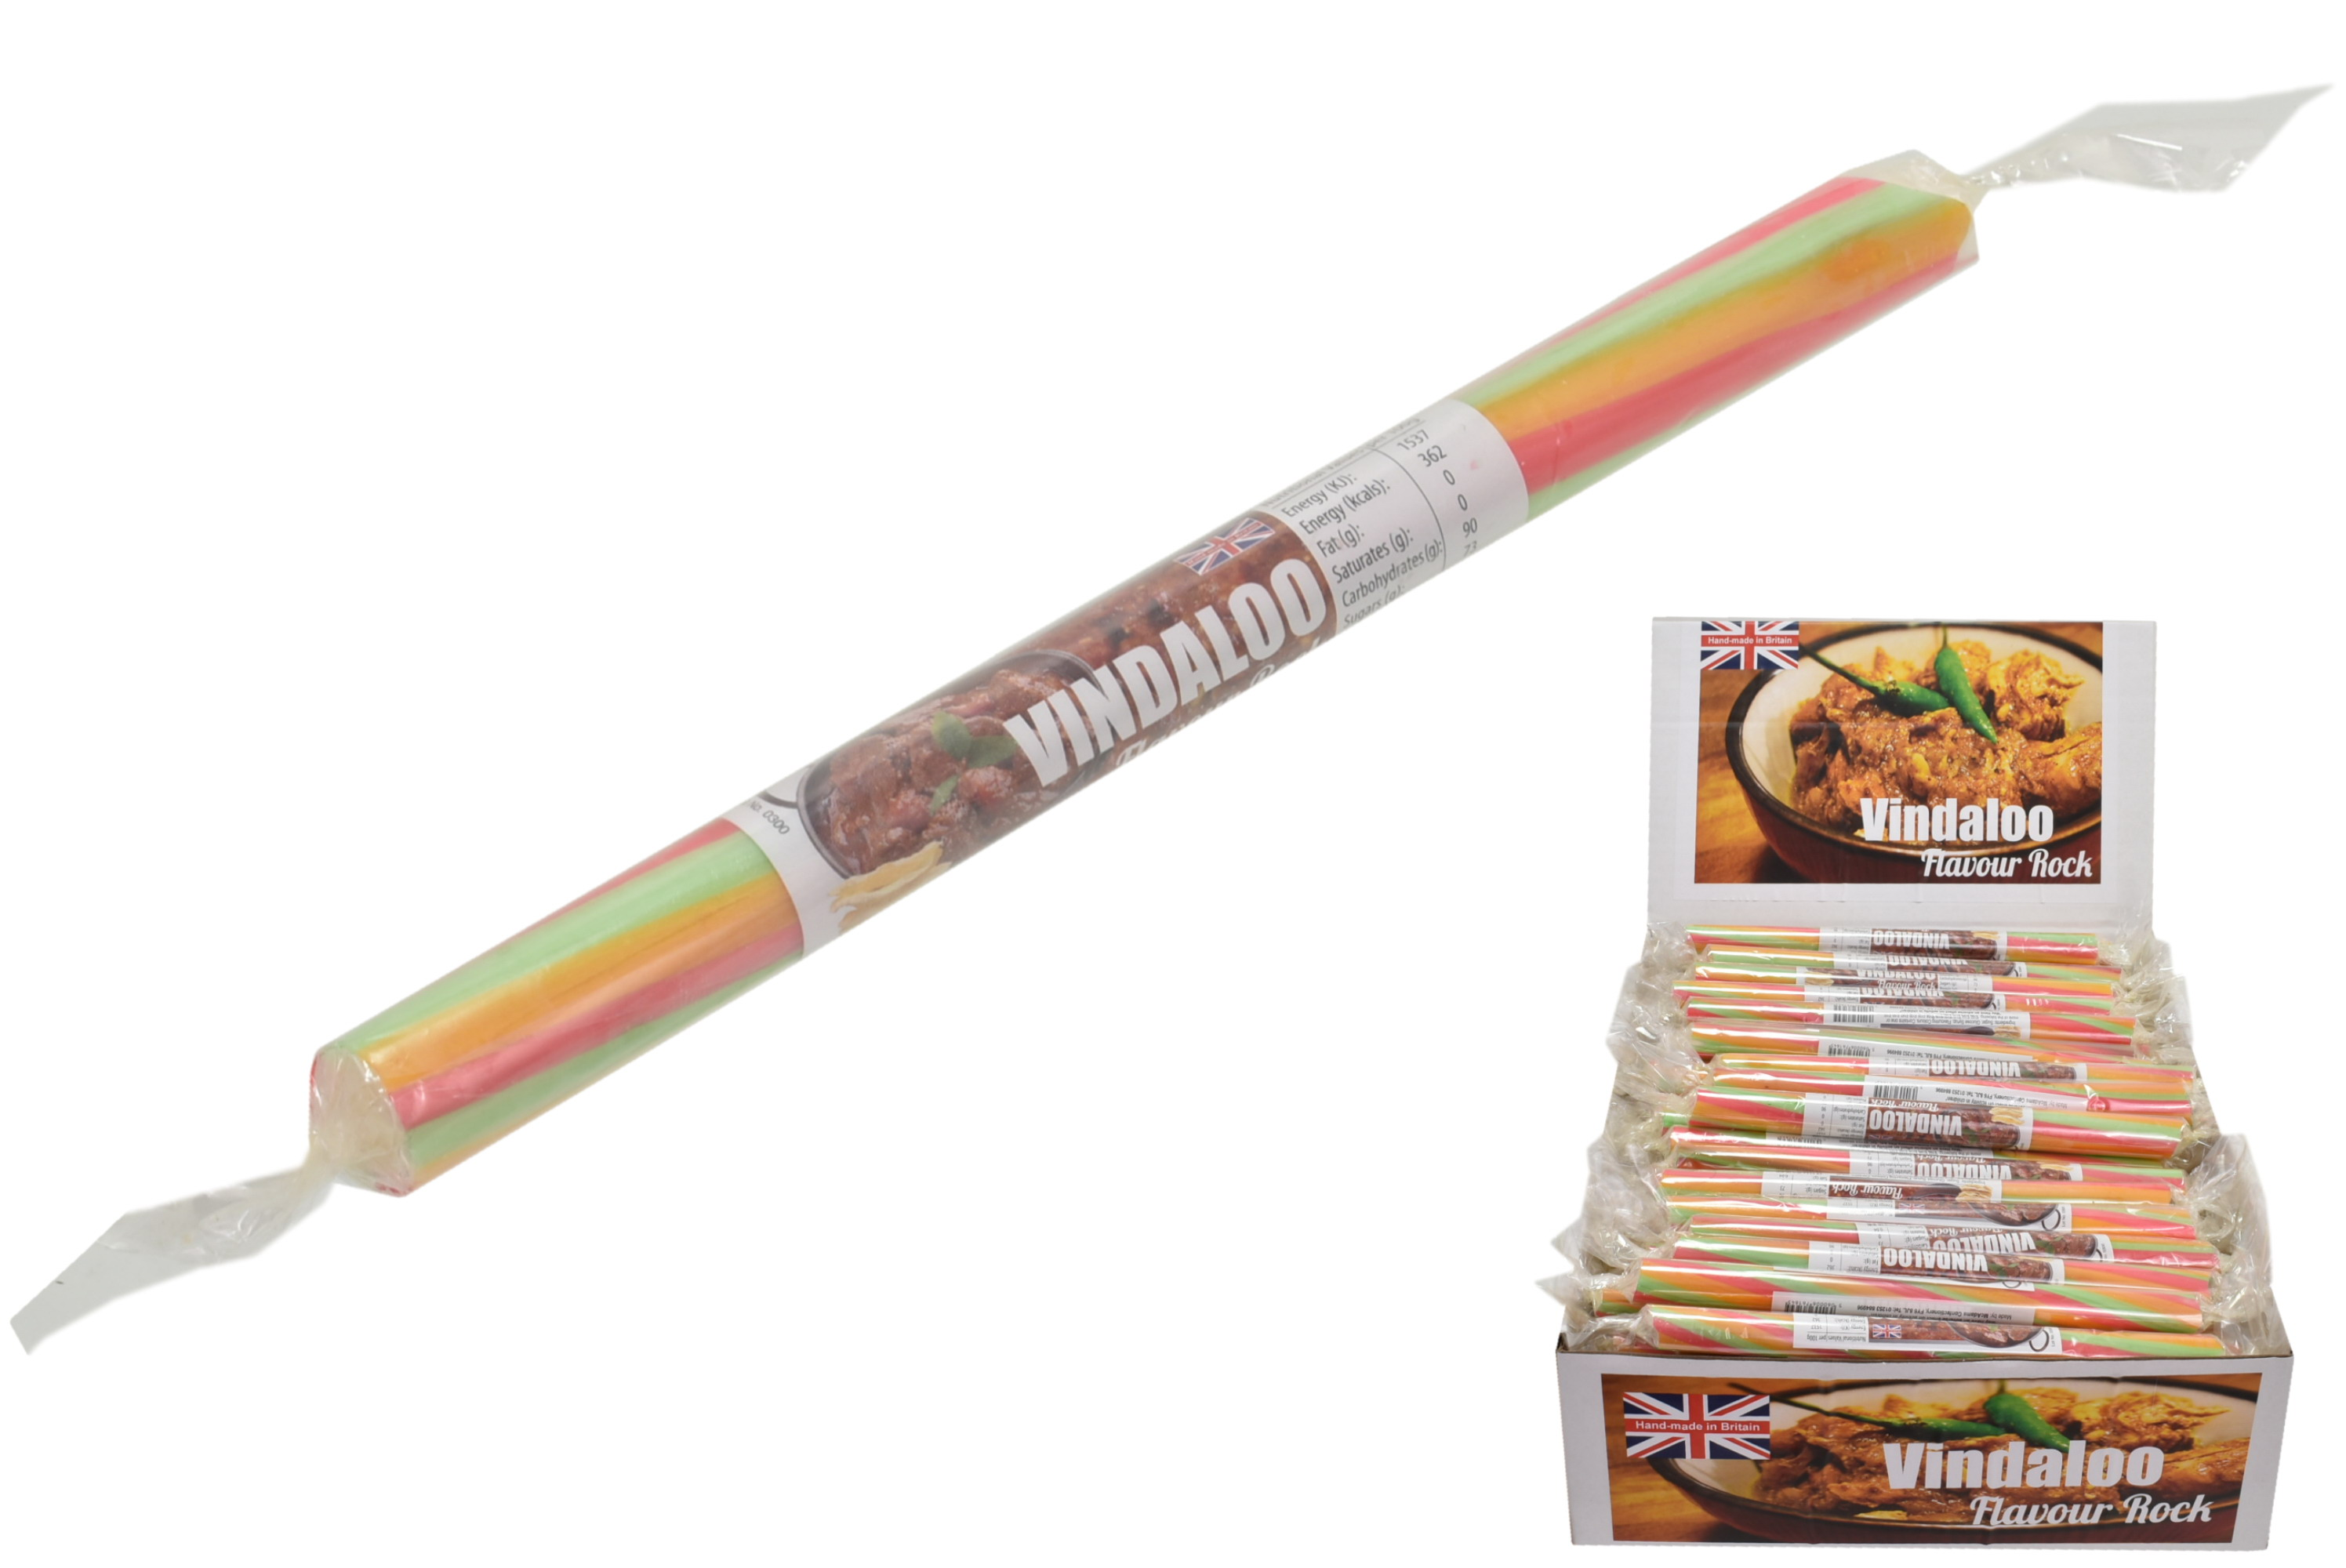 Vindaloo Flavoured Rock Sticks In Display Box